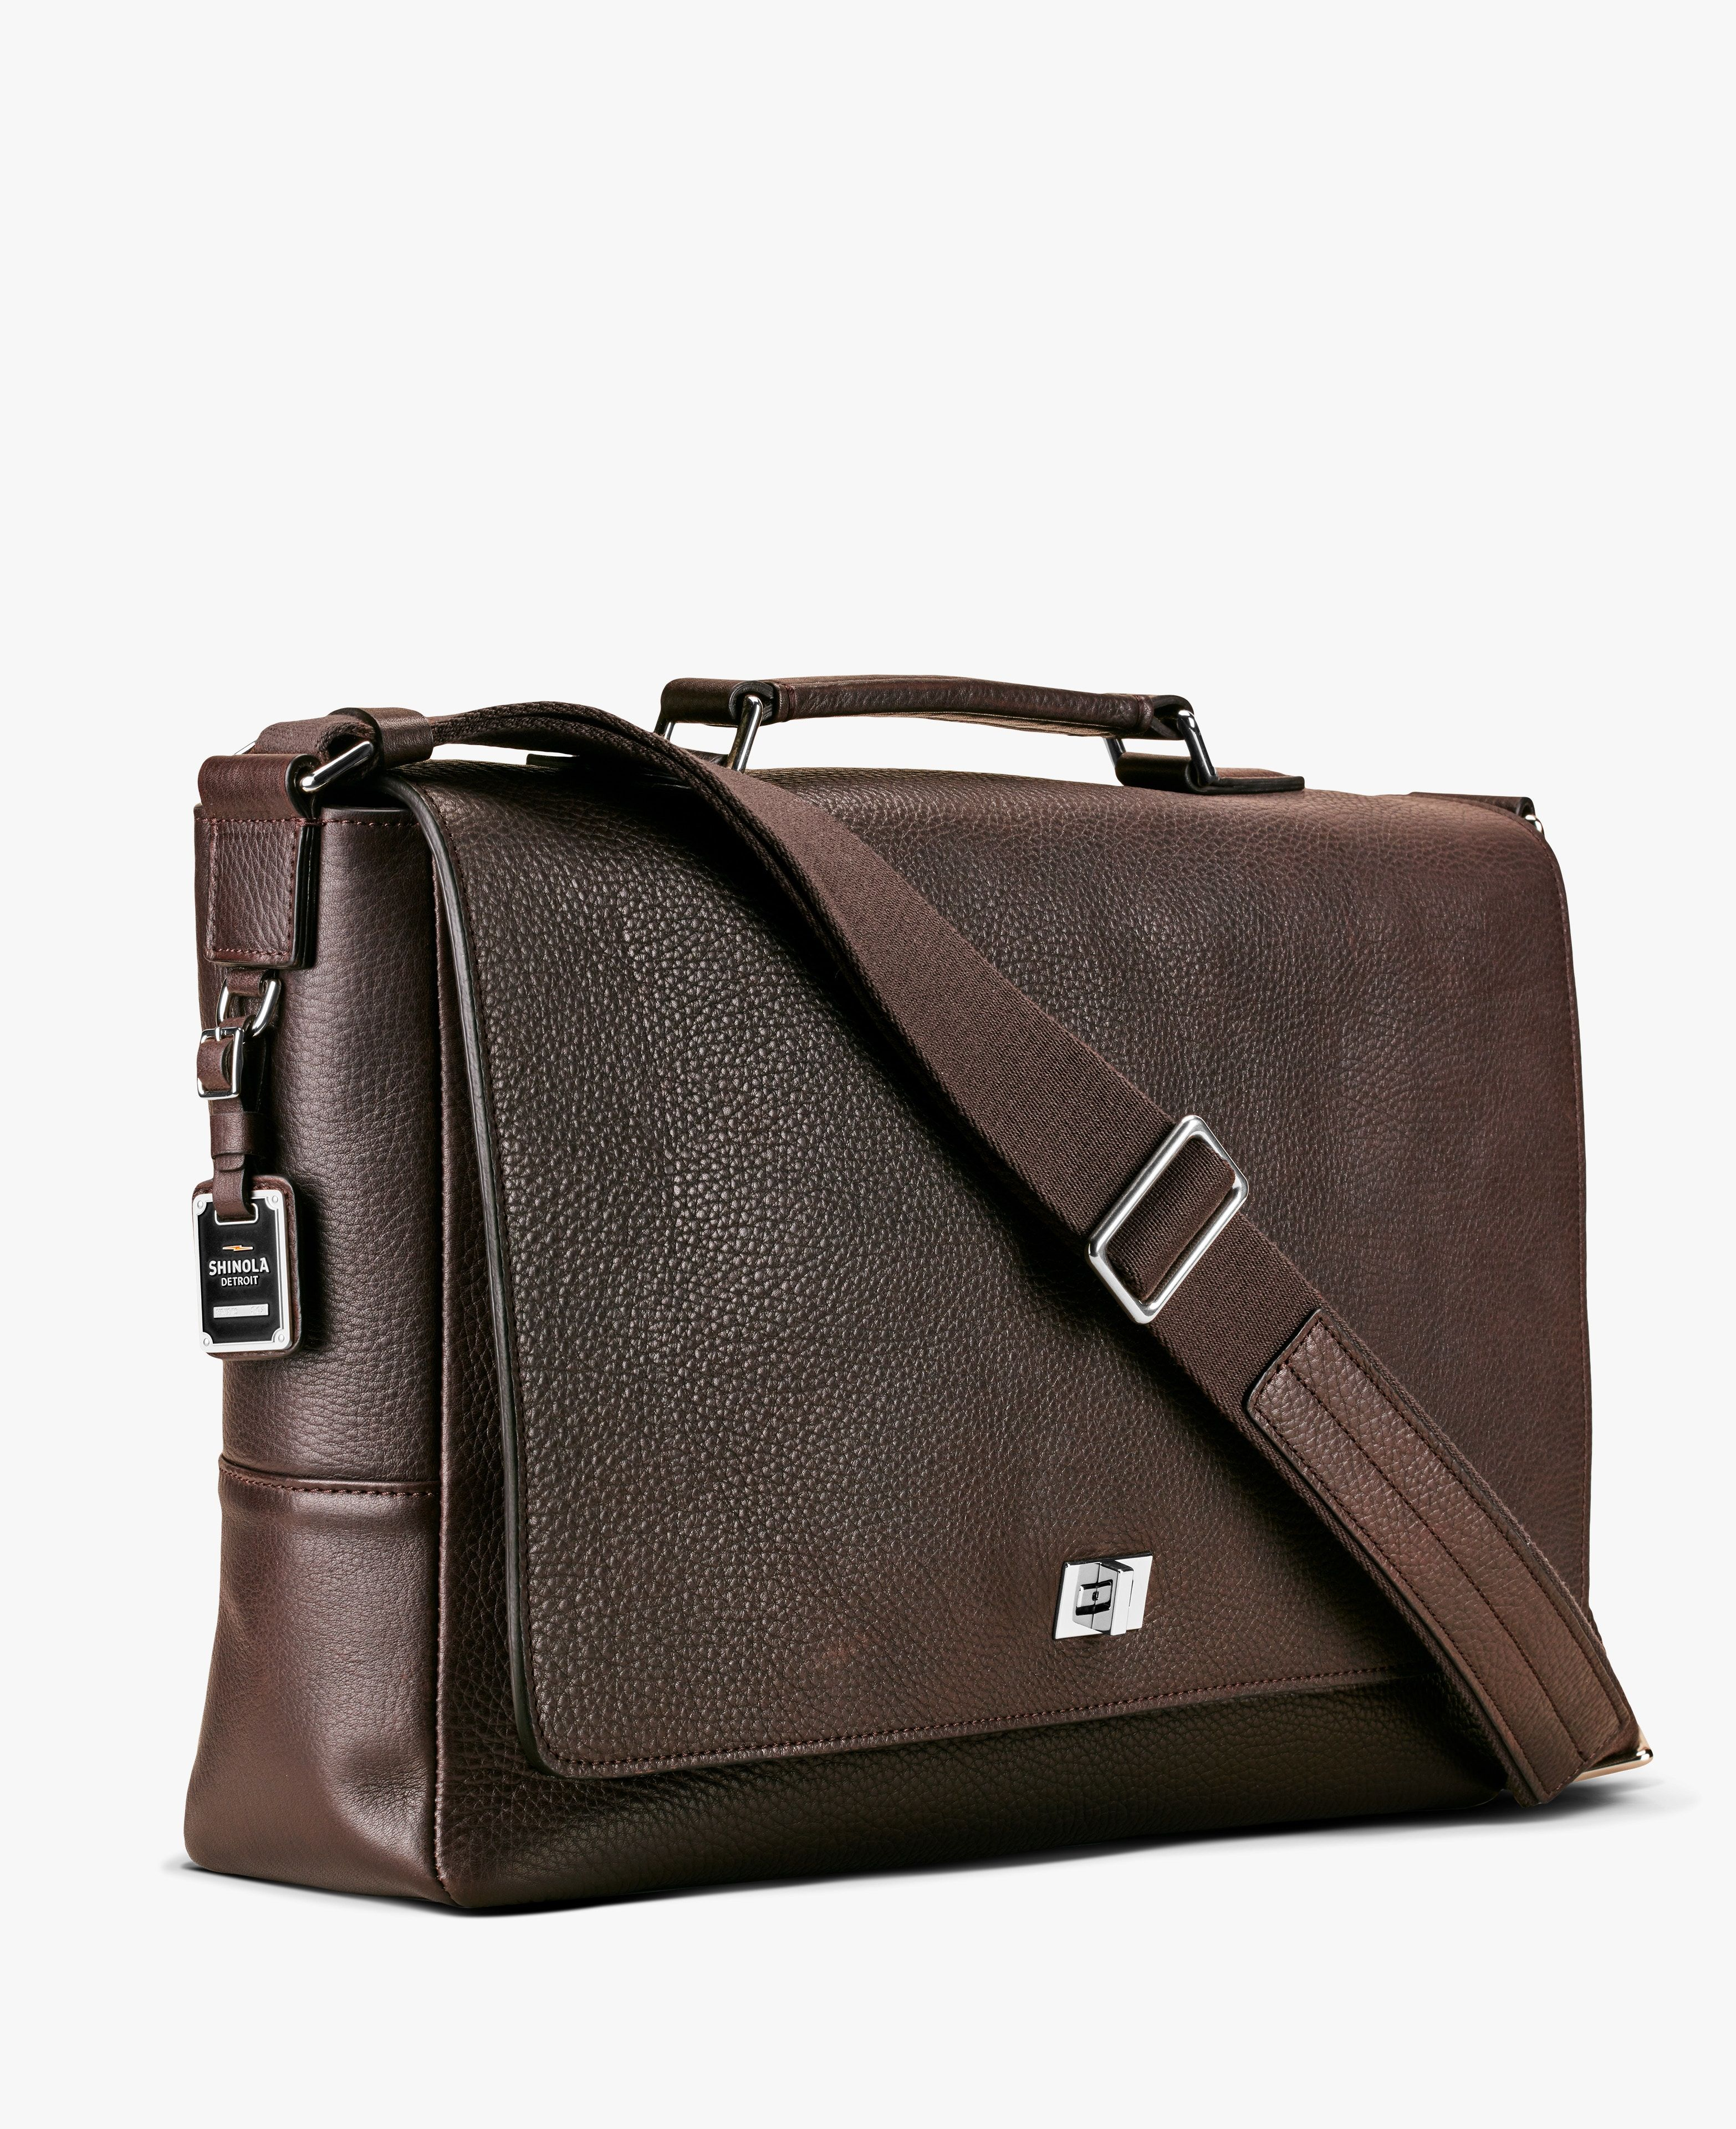 17bb56ecdfe9c Men s Leather Bag - Messenger Brief